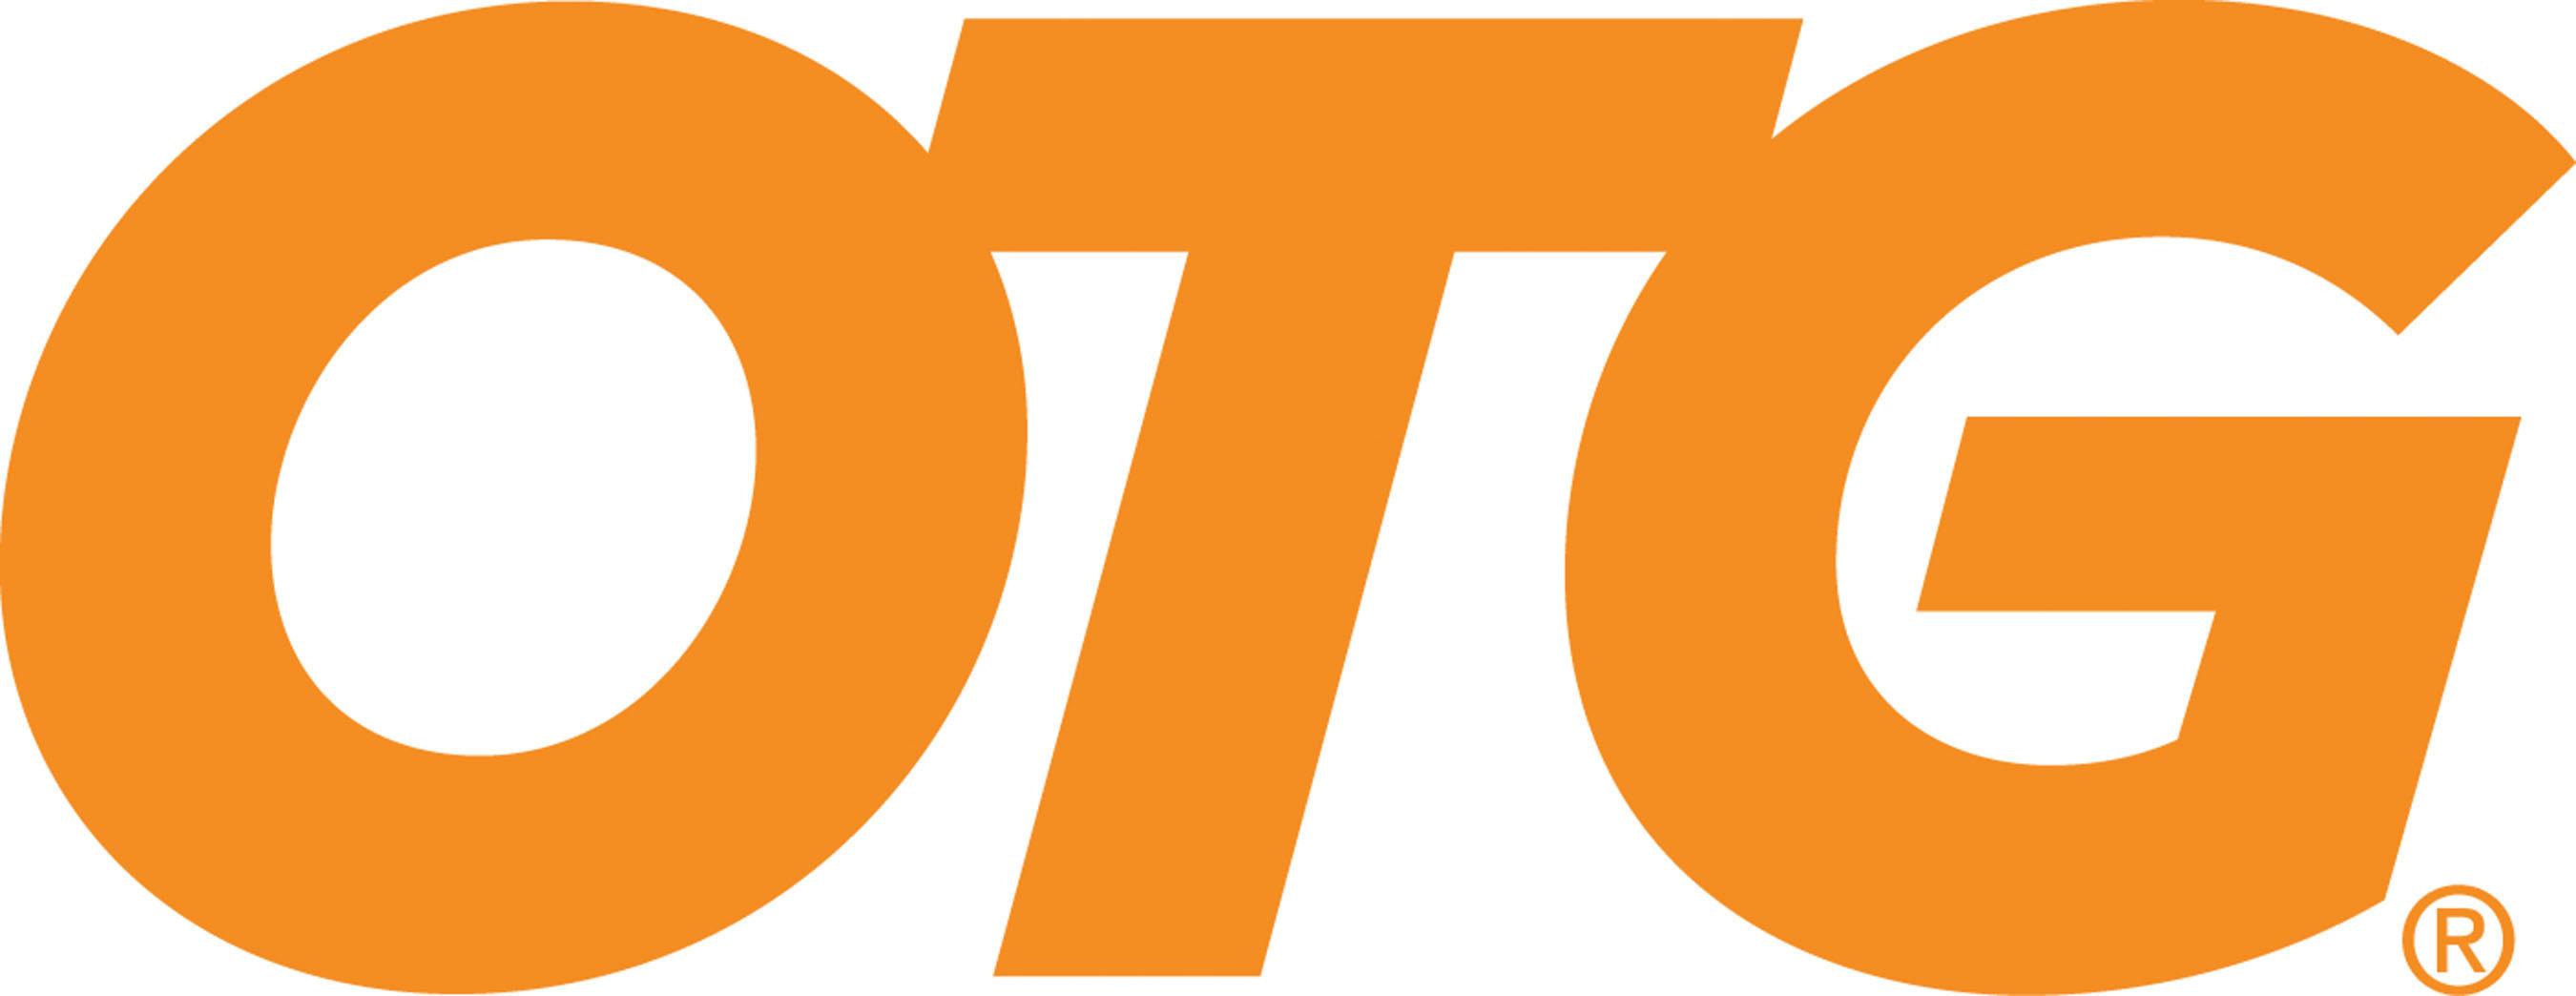 OTG Logo. (PRNewsFoto/OTG) (PRNewsFoto/OTG)